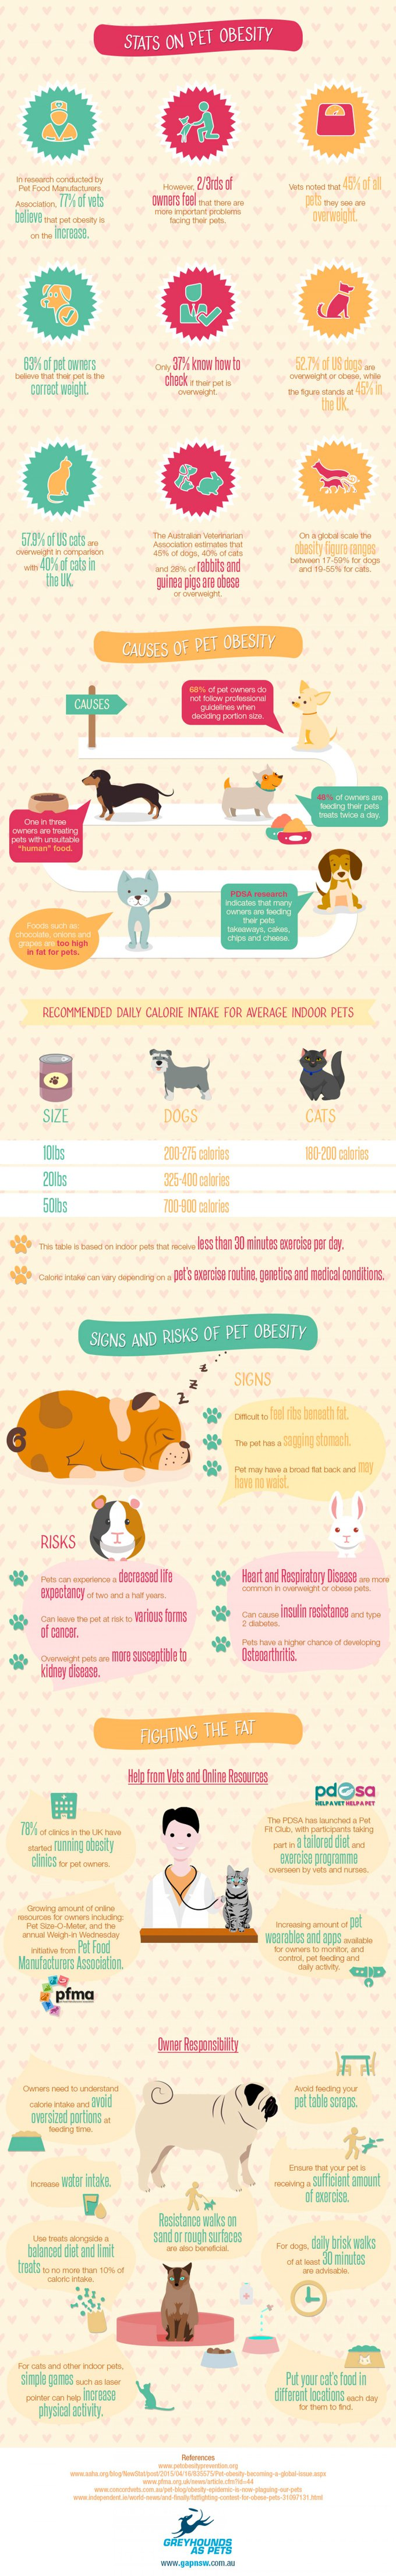 blog_yummypets_pet_obesity_08_2015